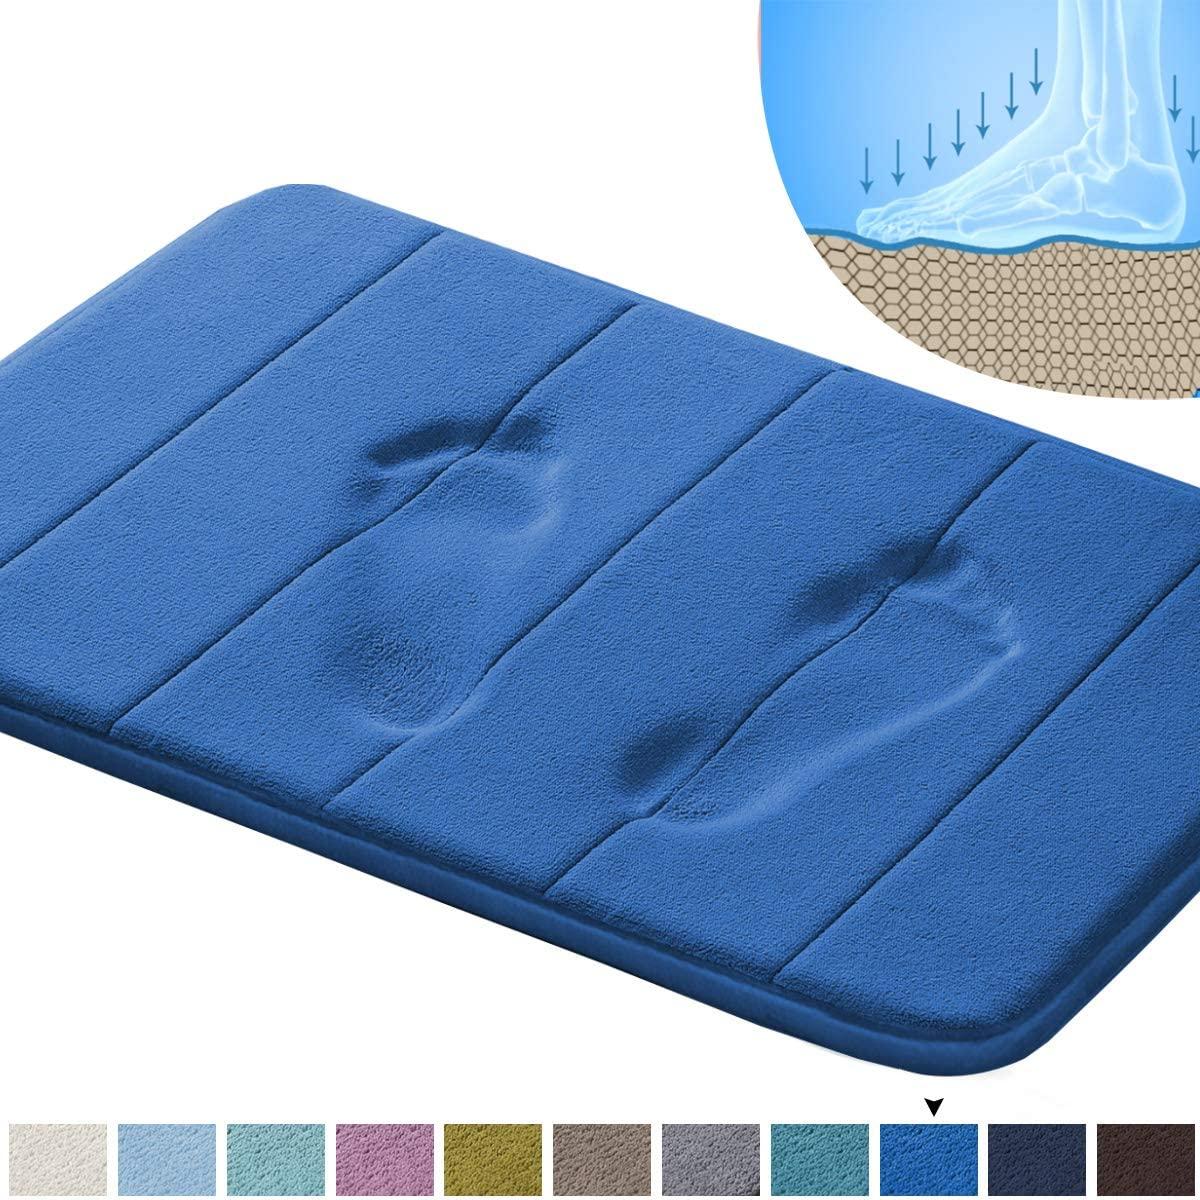 Memory Foam Bath Mat Non Slip Absorbent Bathroom Mat Super Cozy Velvety Bathroom Rug Carpet (Royal Blue Striped Pattern 20x32-Inches)